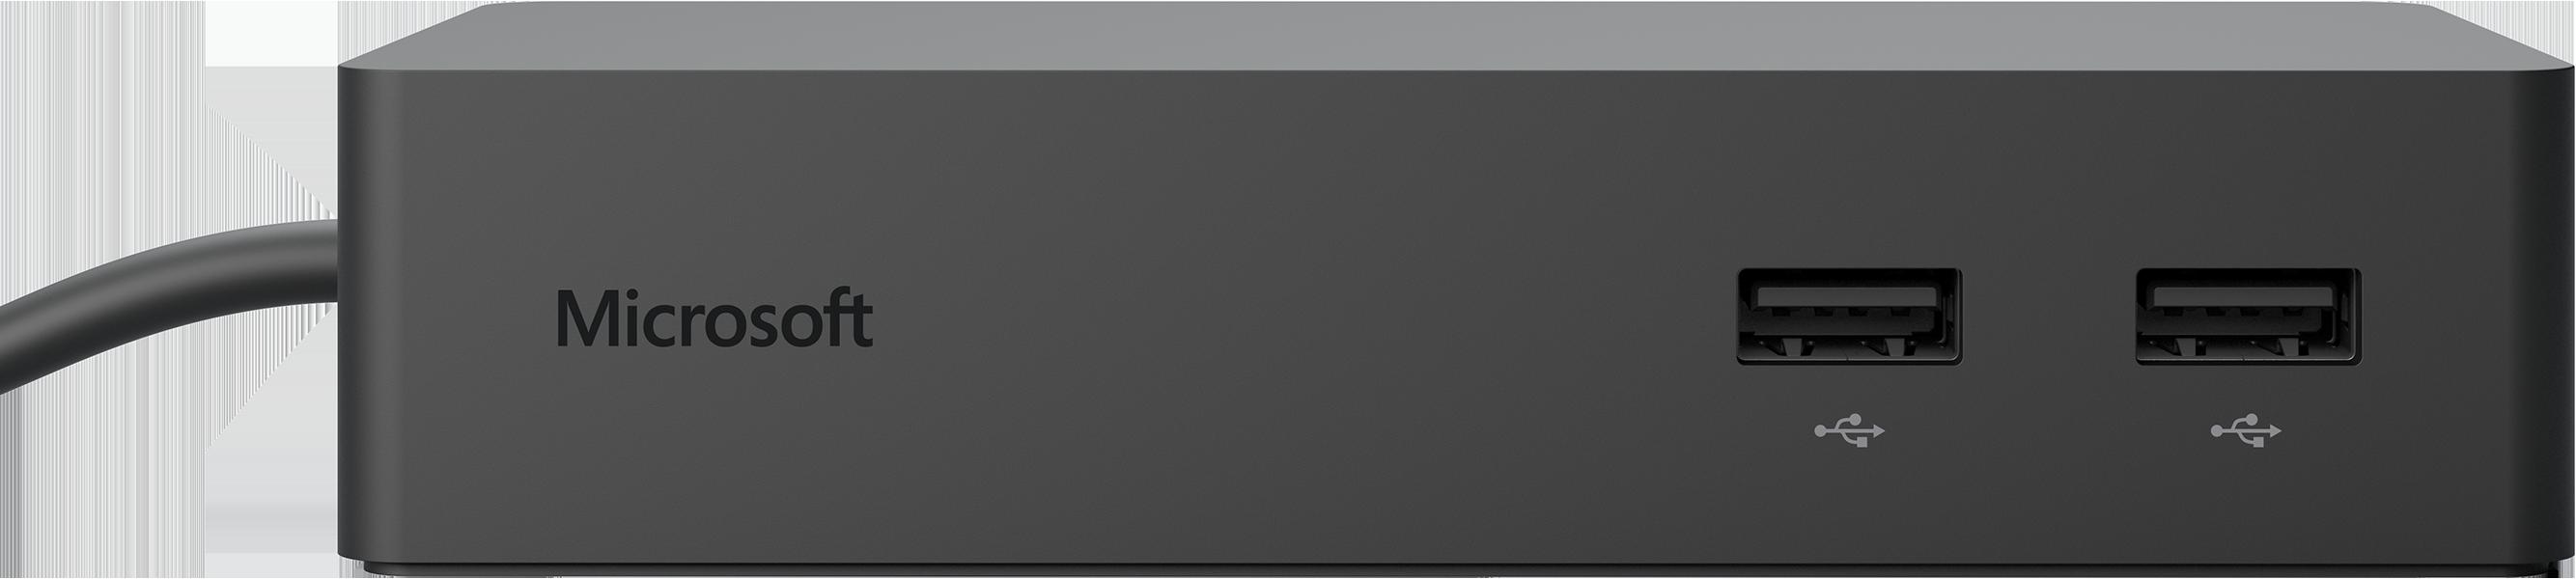 Microsoft Docking Station Audio Device Drivers for Mac